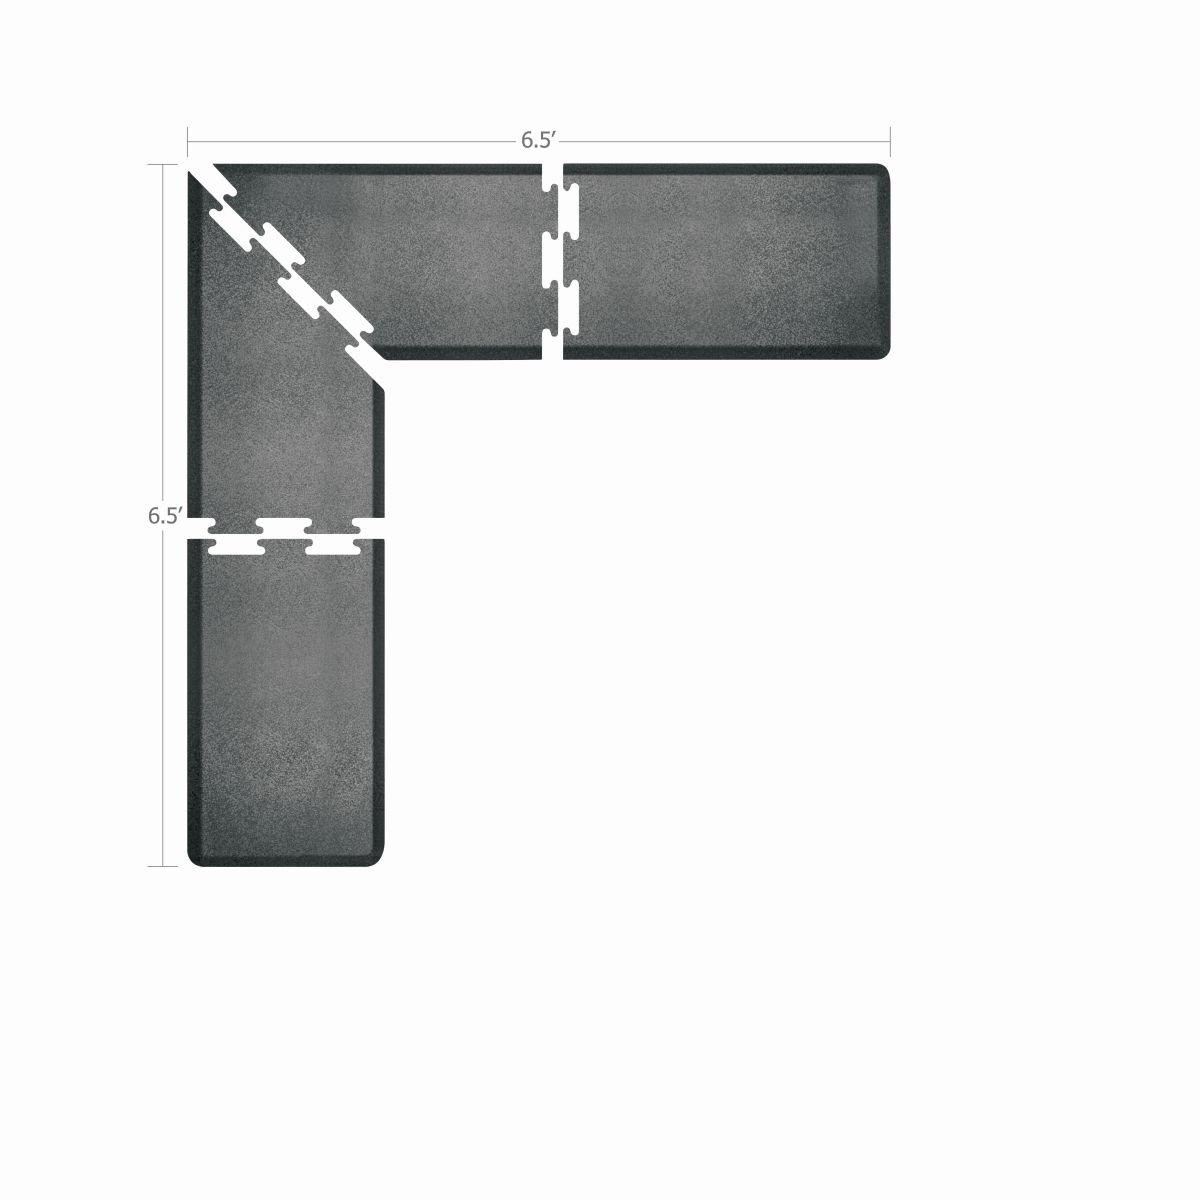 WellnessMats Puzzle Piece Collection 2 Foot Wide L Series Granite Steel Anti-Fatigue 6.5 x 6.5 Foot Mat